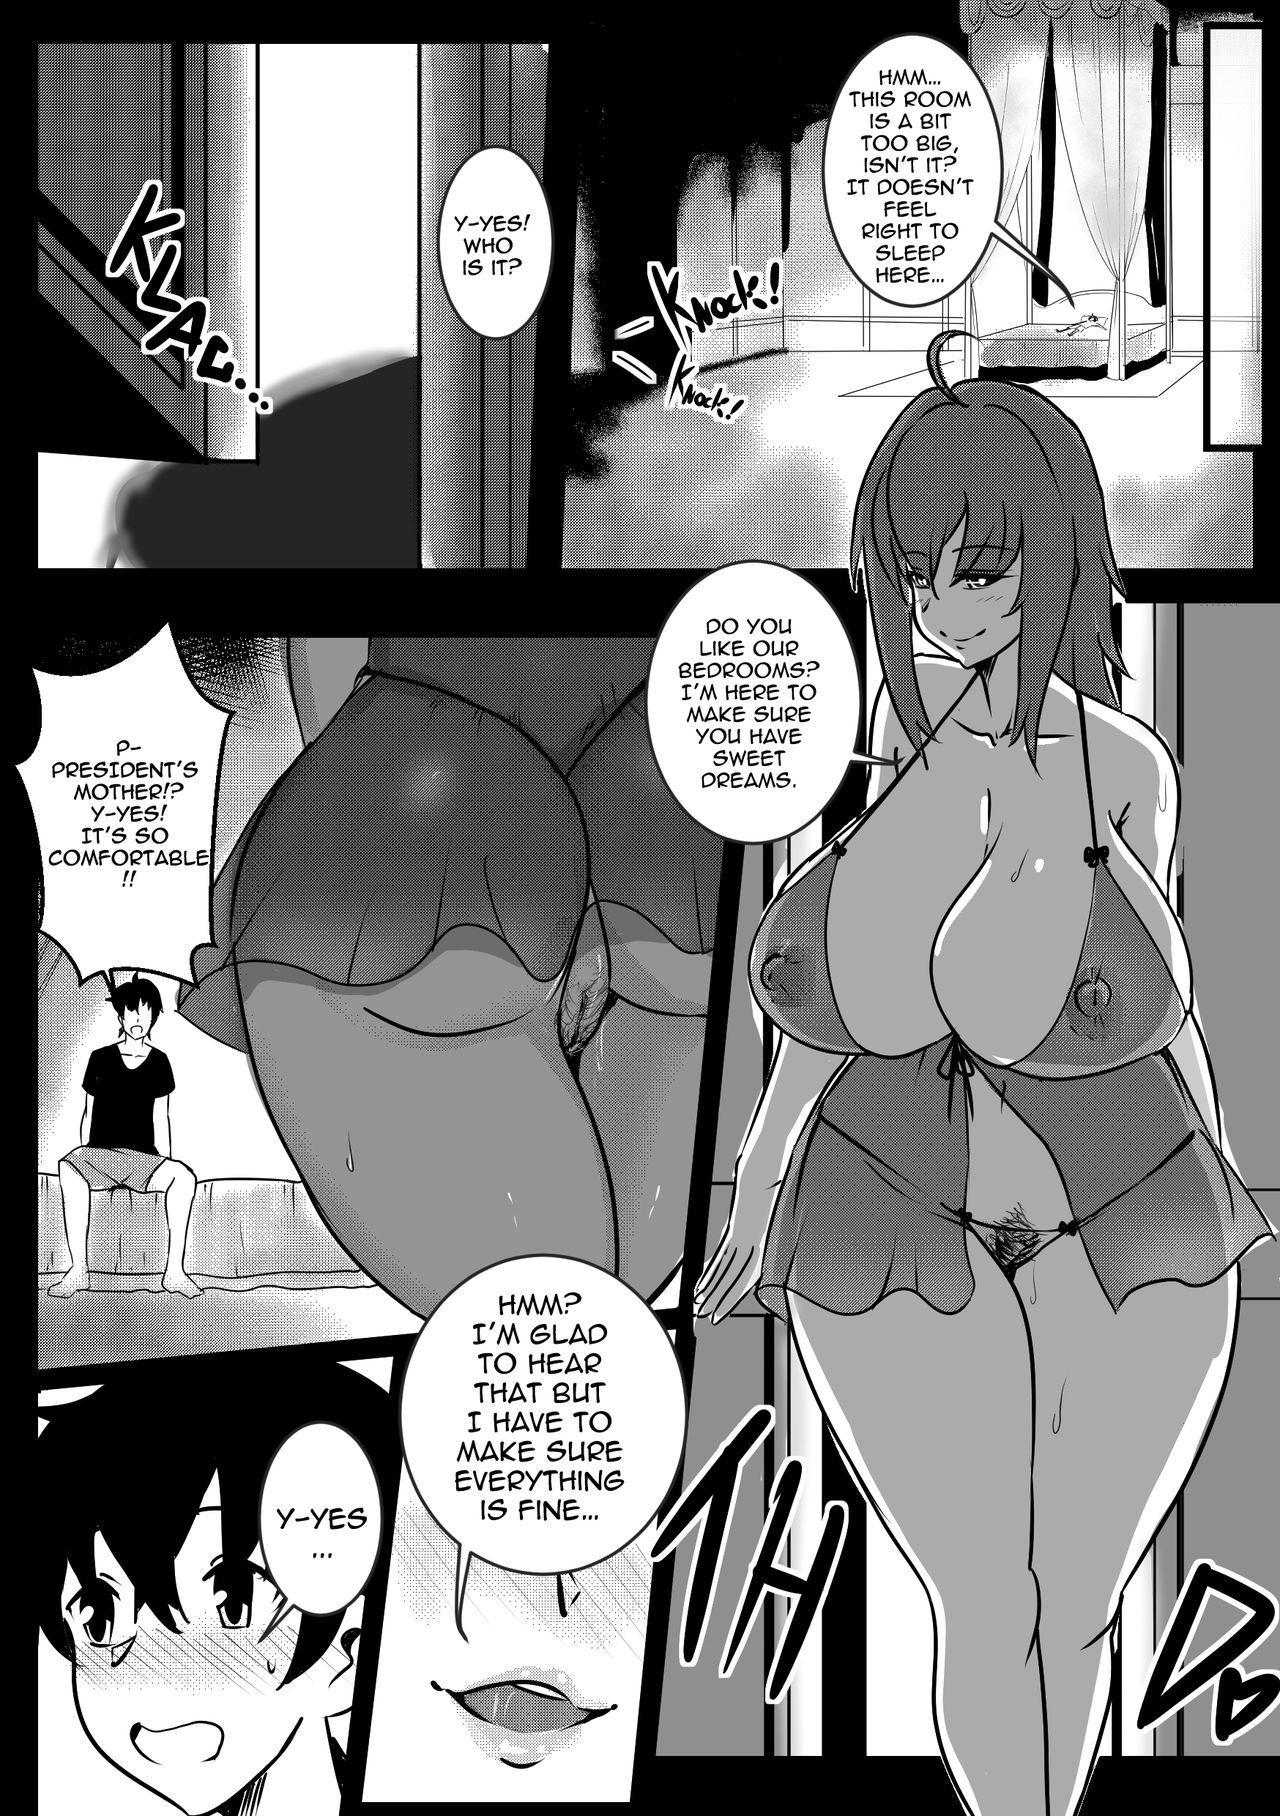 [Merkonig] B-Trayal 23 Venelana (HighSchoolDxD) Uncensored (EN) 4